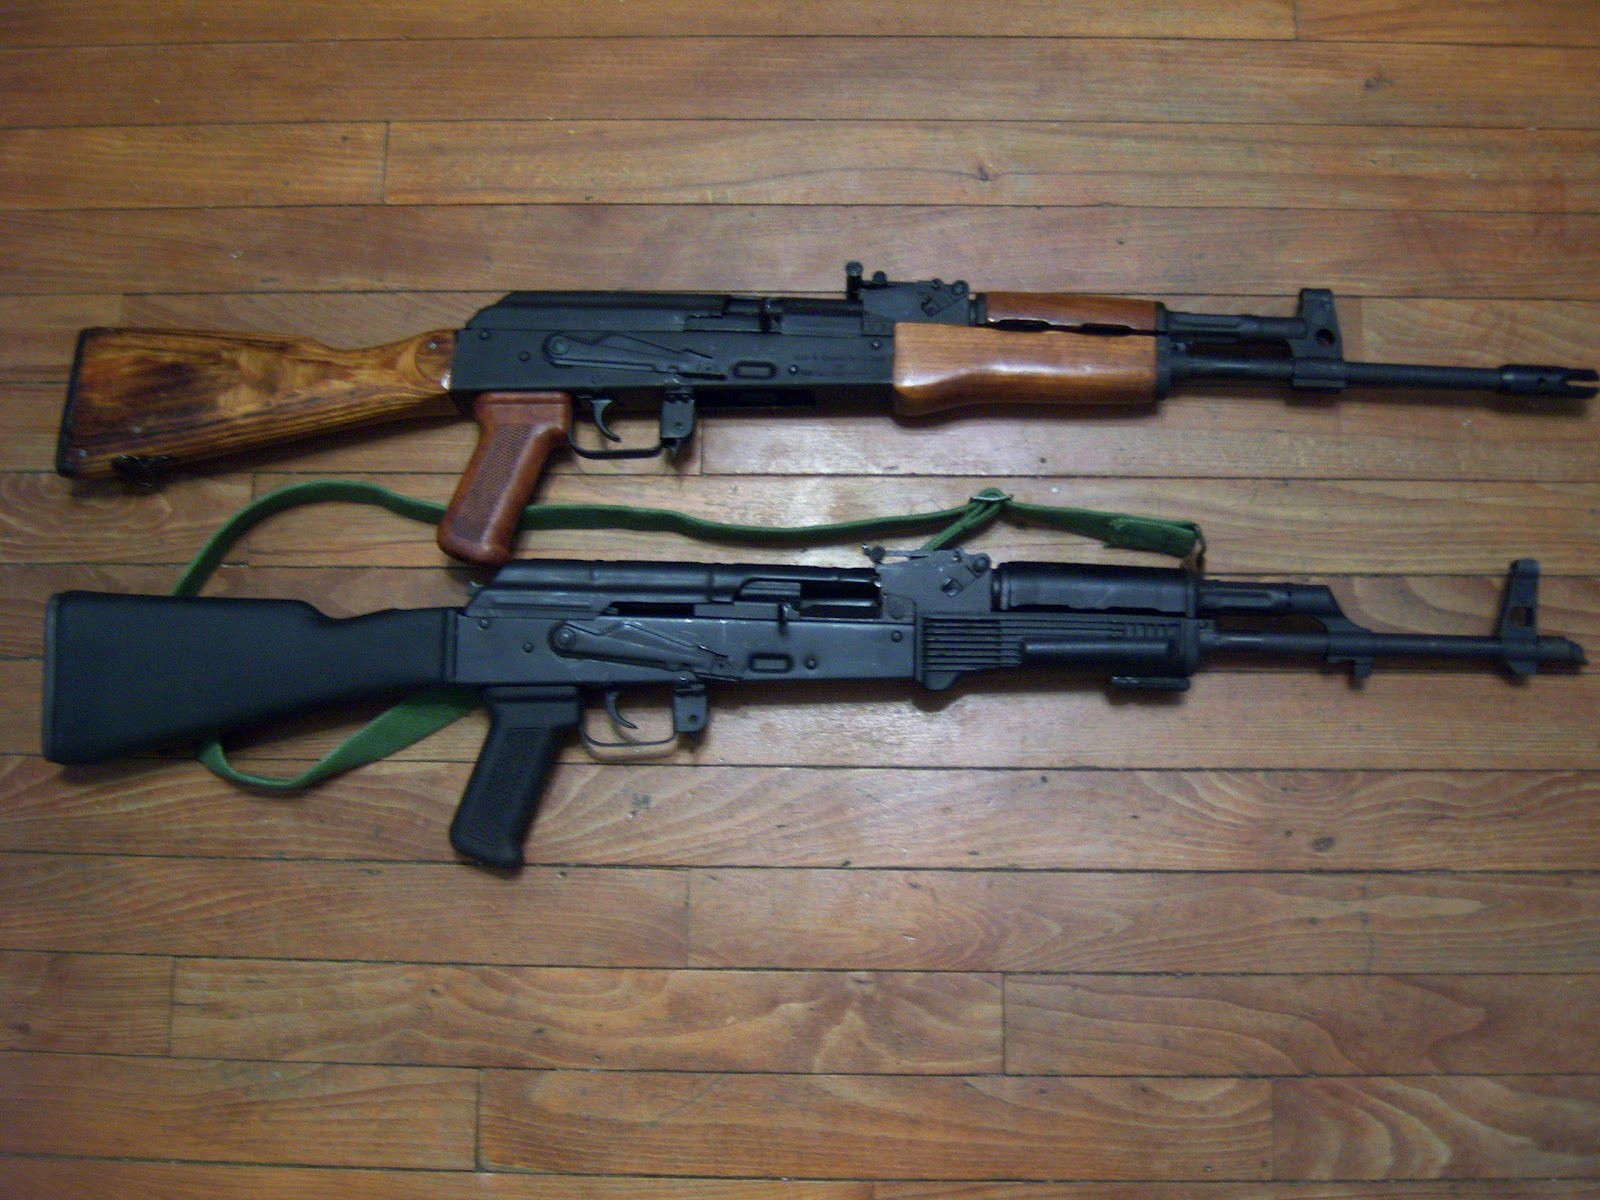 Ak47 Talk M10 22 And Akt98 Side By Side Comparison